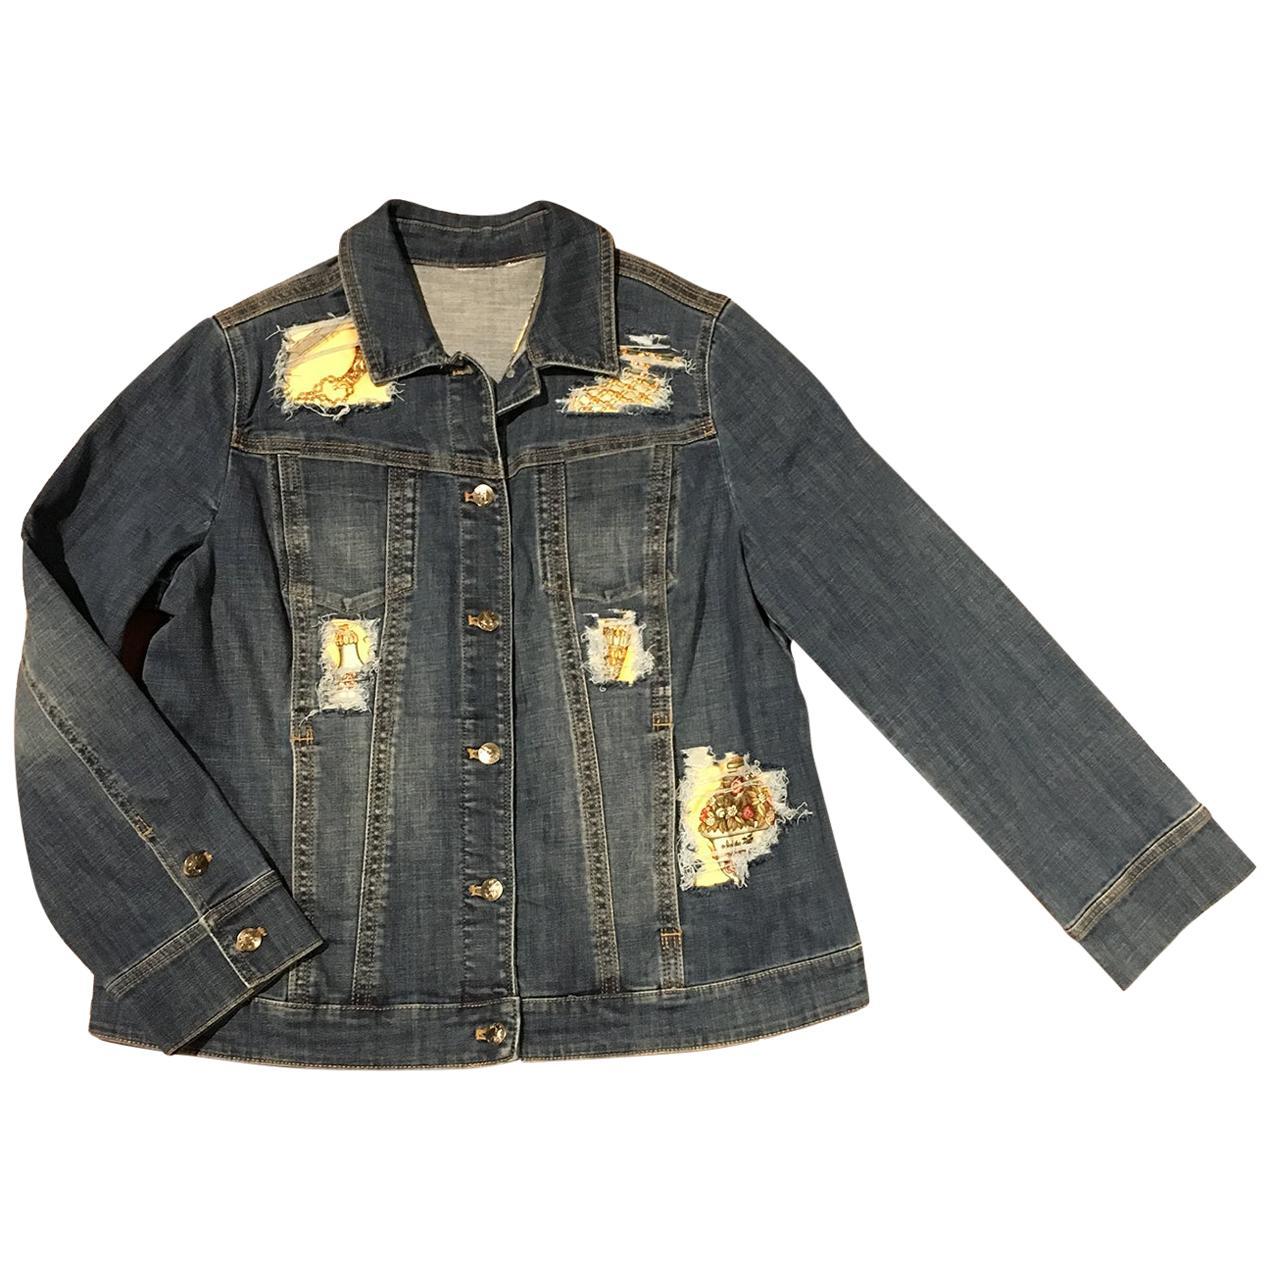 Hermes Qui' Import le Flacons Silk Scarf Distressed Denim Jacket-Medium